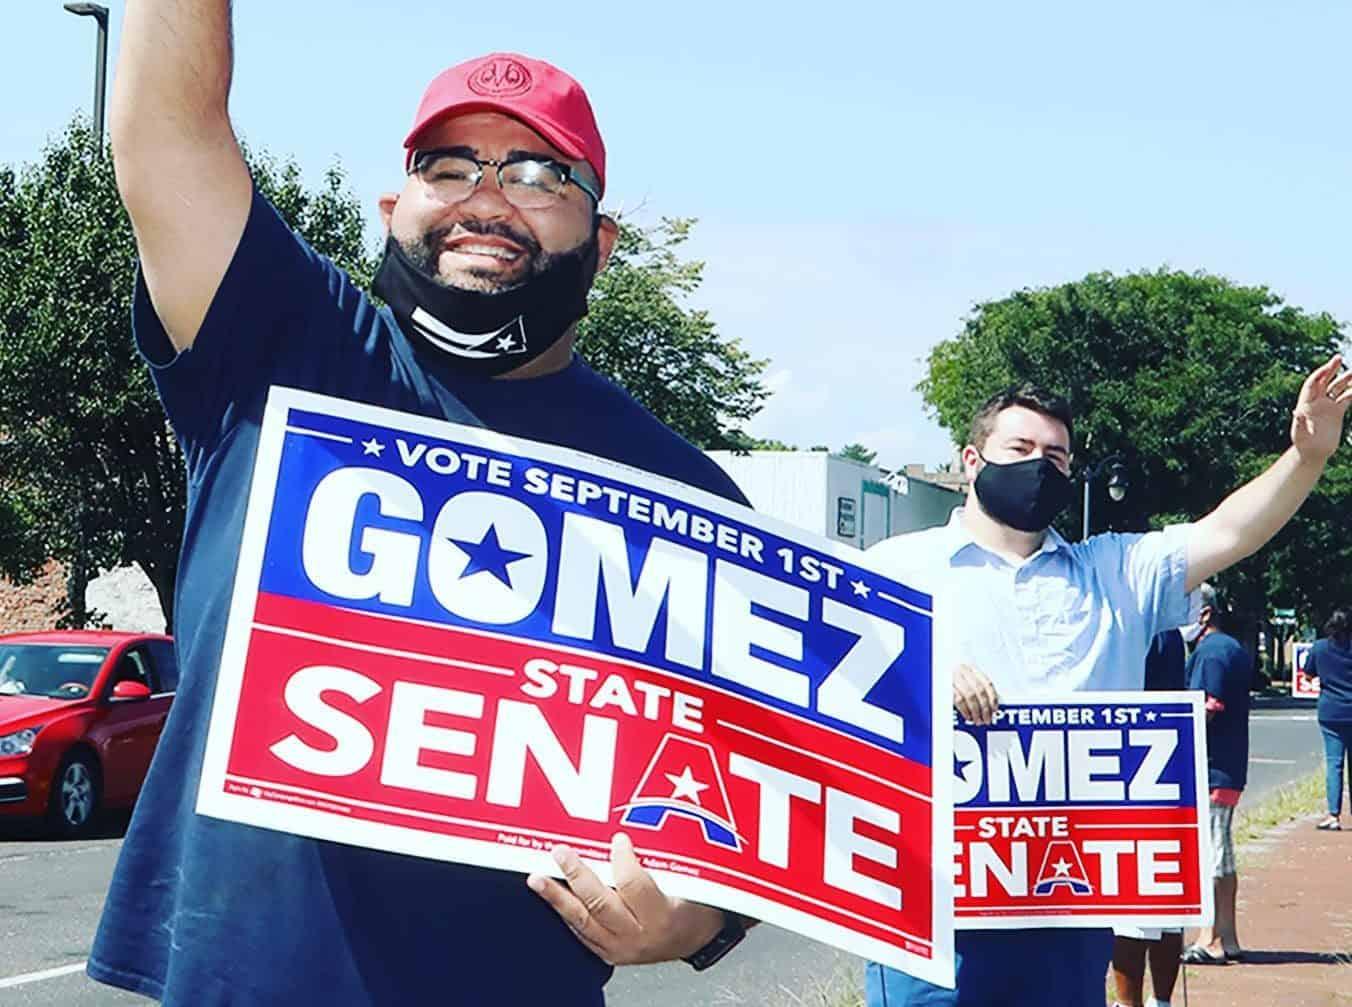 Adam Gomez: first Latino to serve in the Massachusetts senate